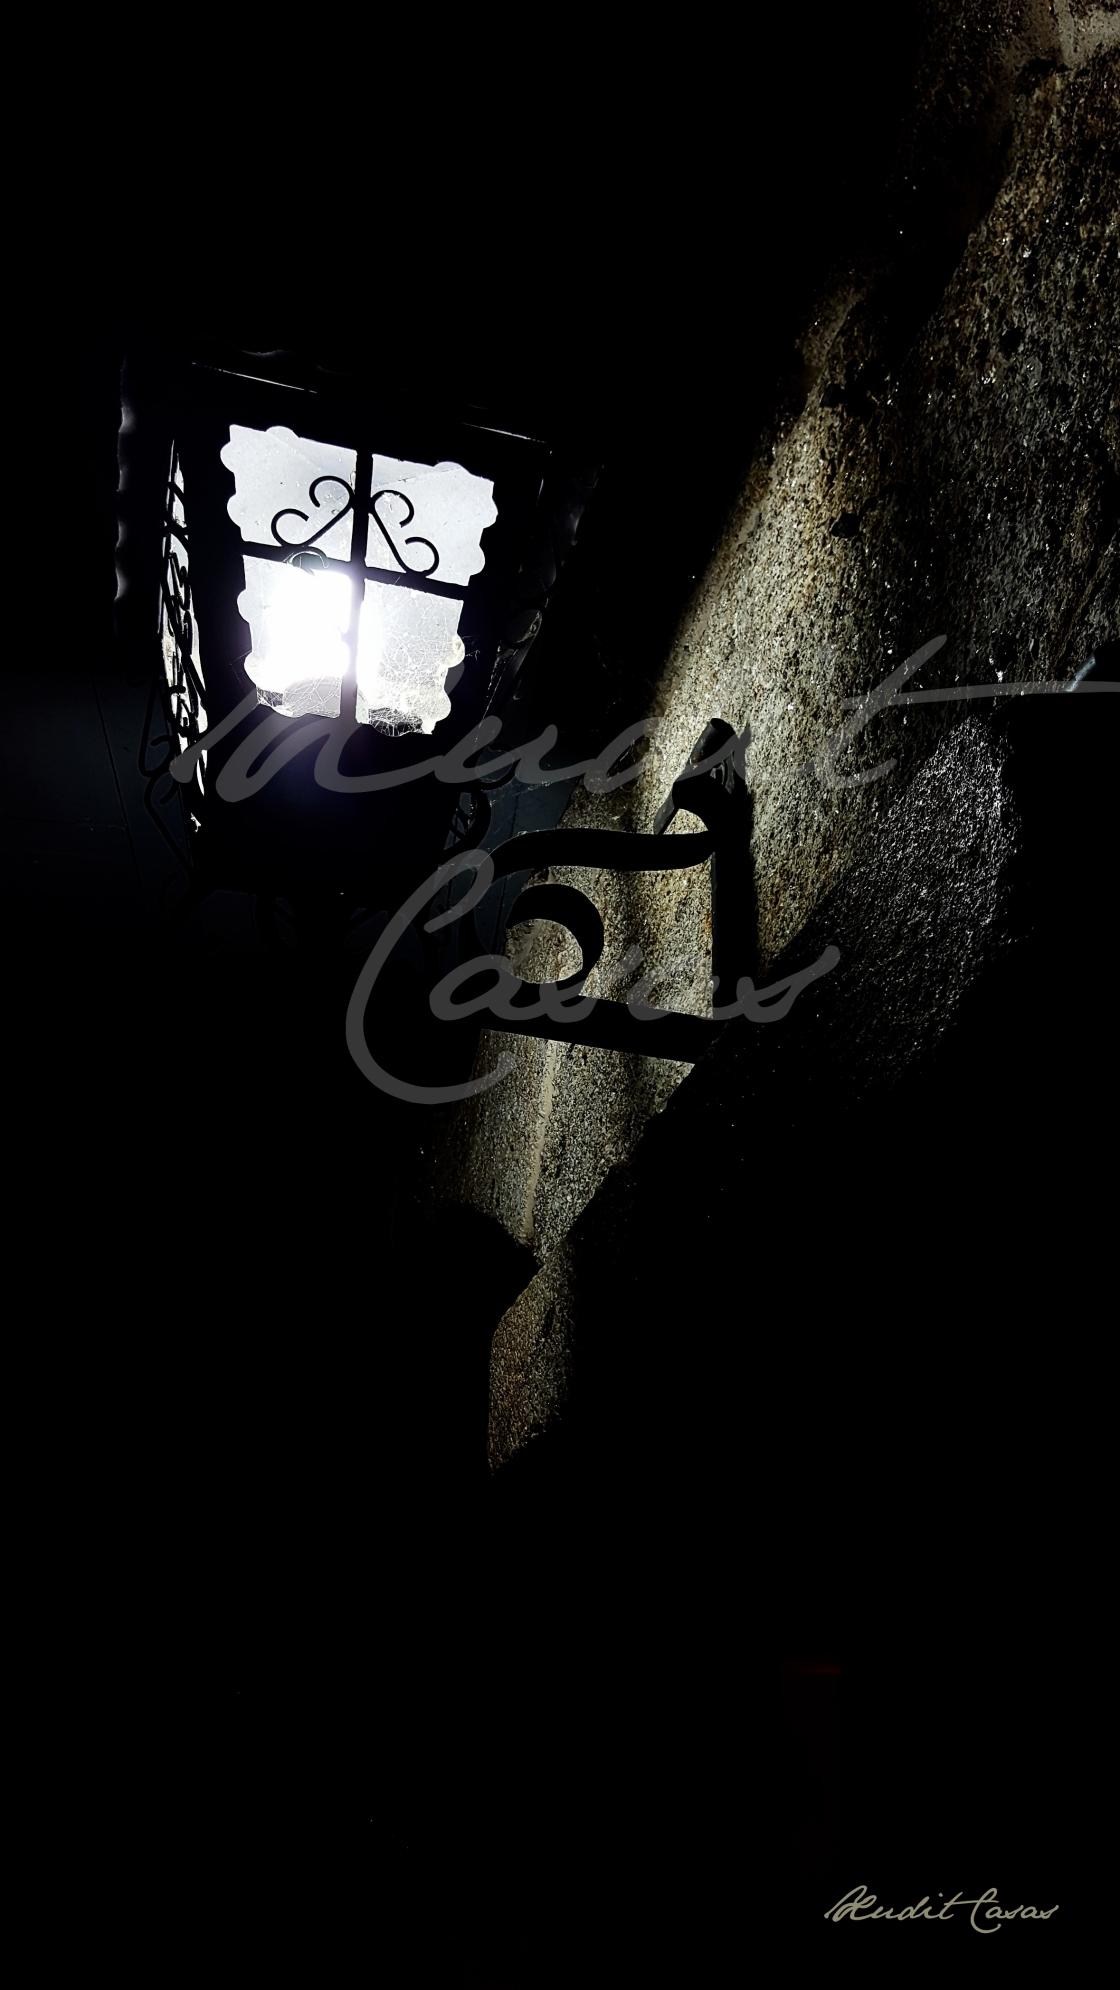 Curta noite de pedra 4_Xudit Casas